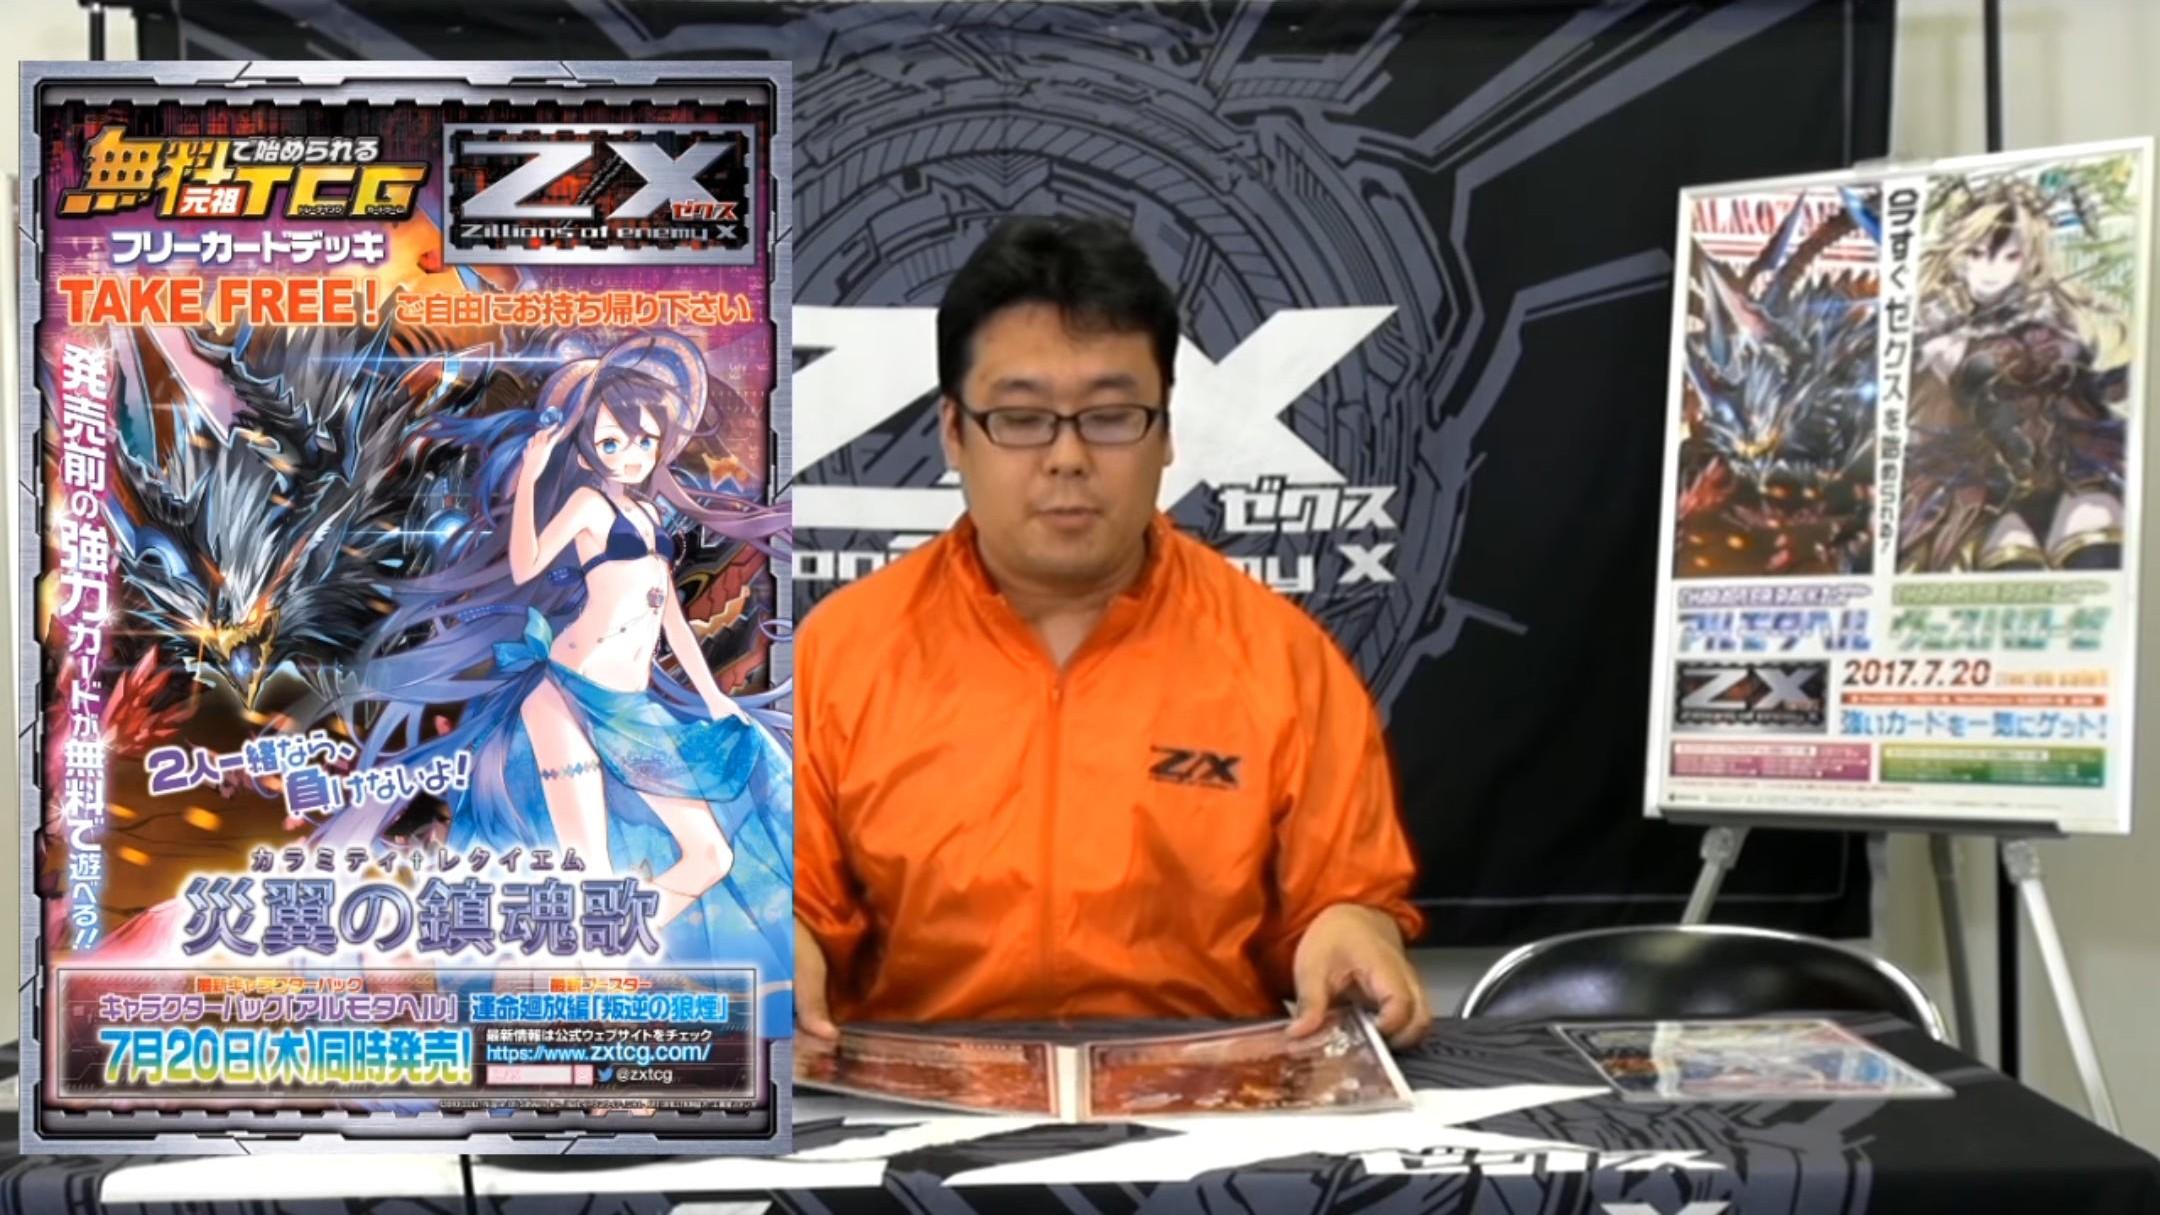 zx-youtube-1700517-002.jpg